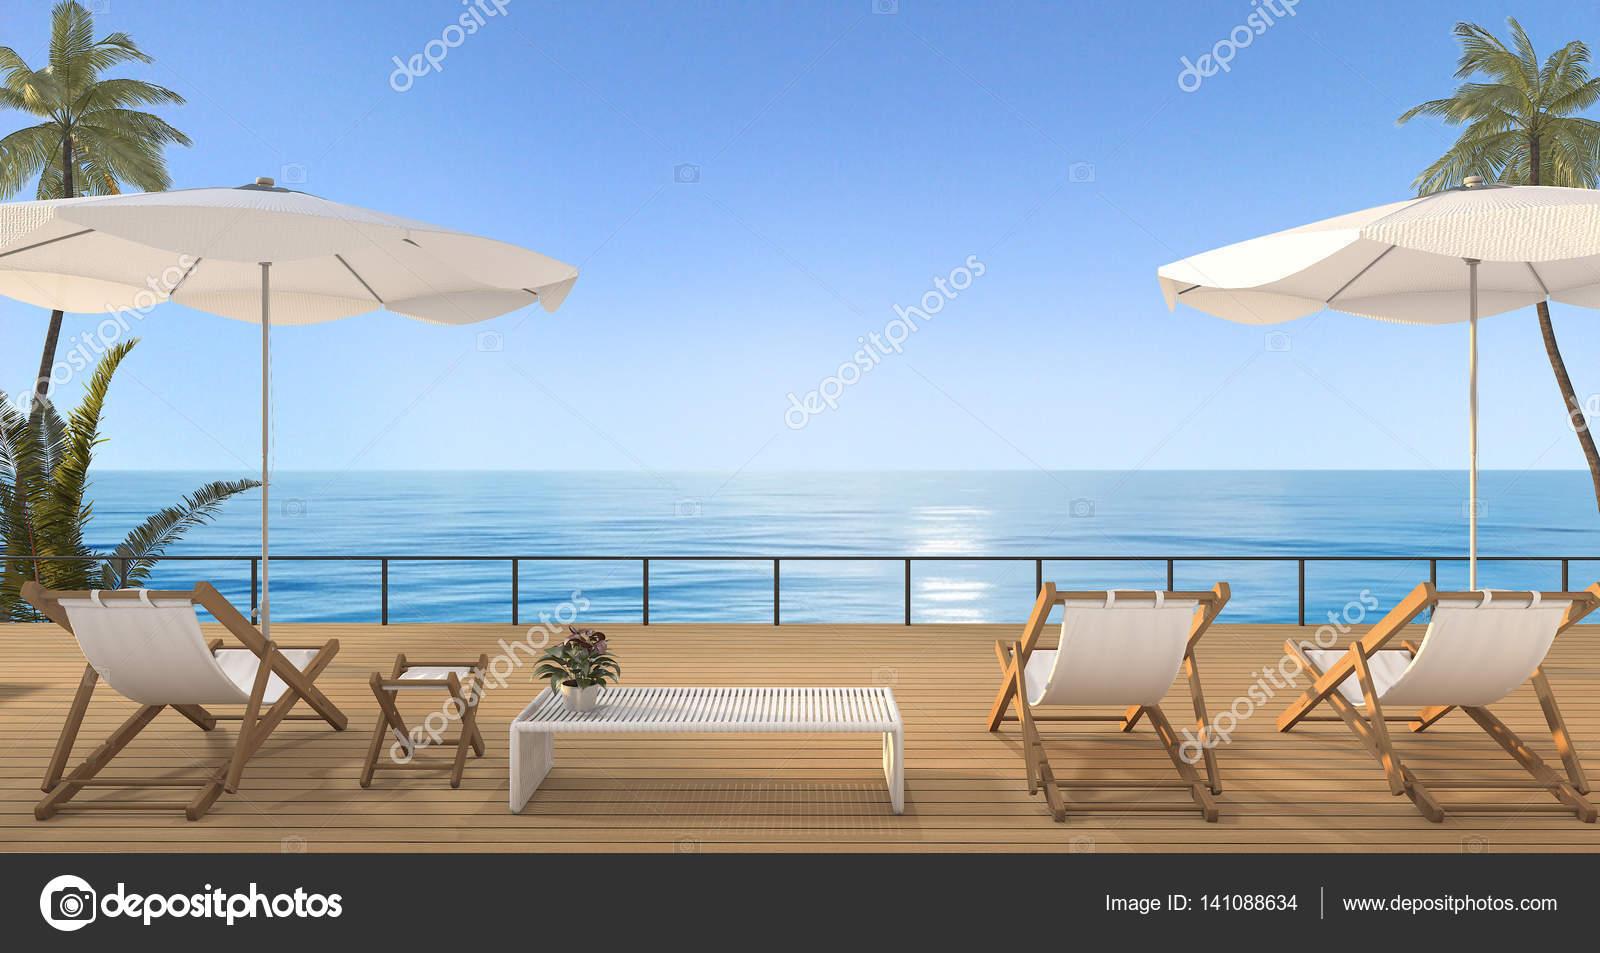 lit de plage vintage rendu 3d sur terrasse bois bord de mer hawaii photographie dit26978. Black Bedroom Furniture Sets. Home Design Ideas